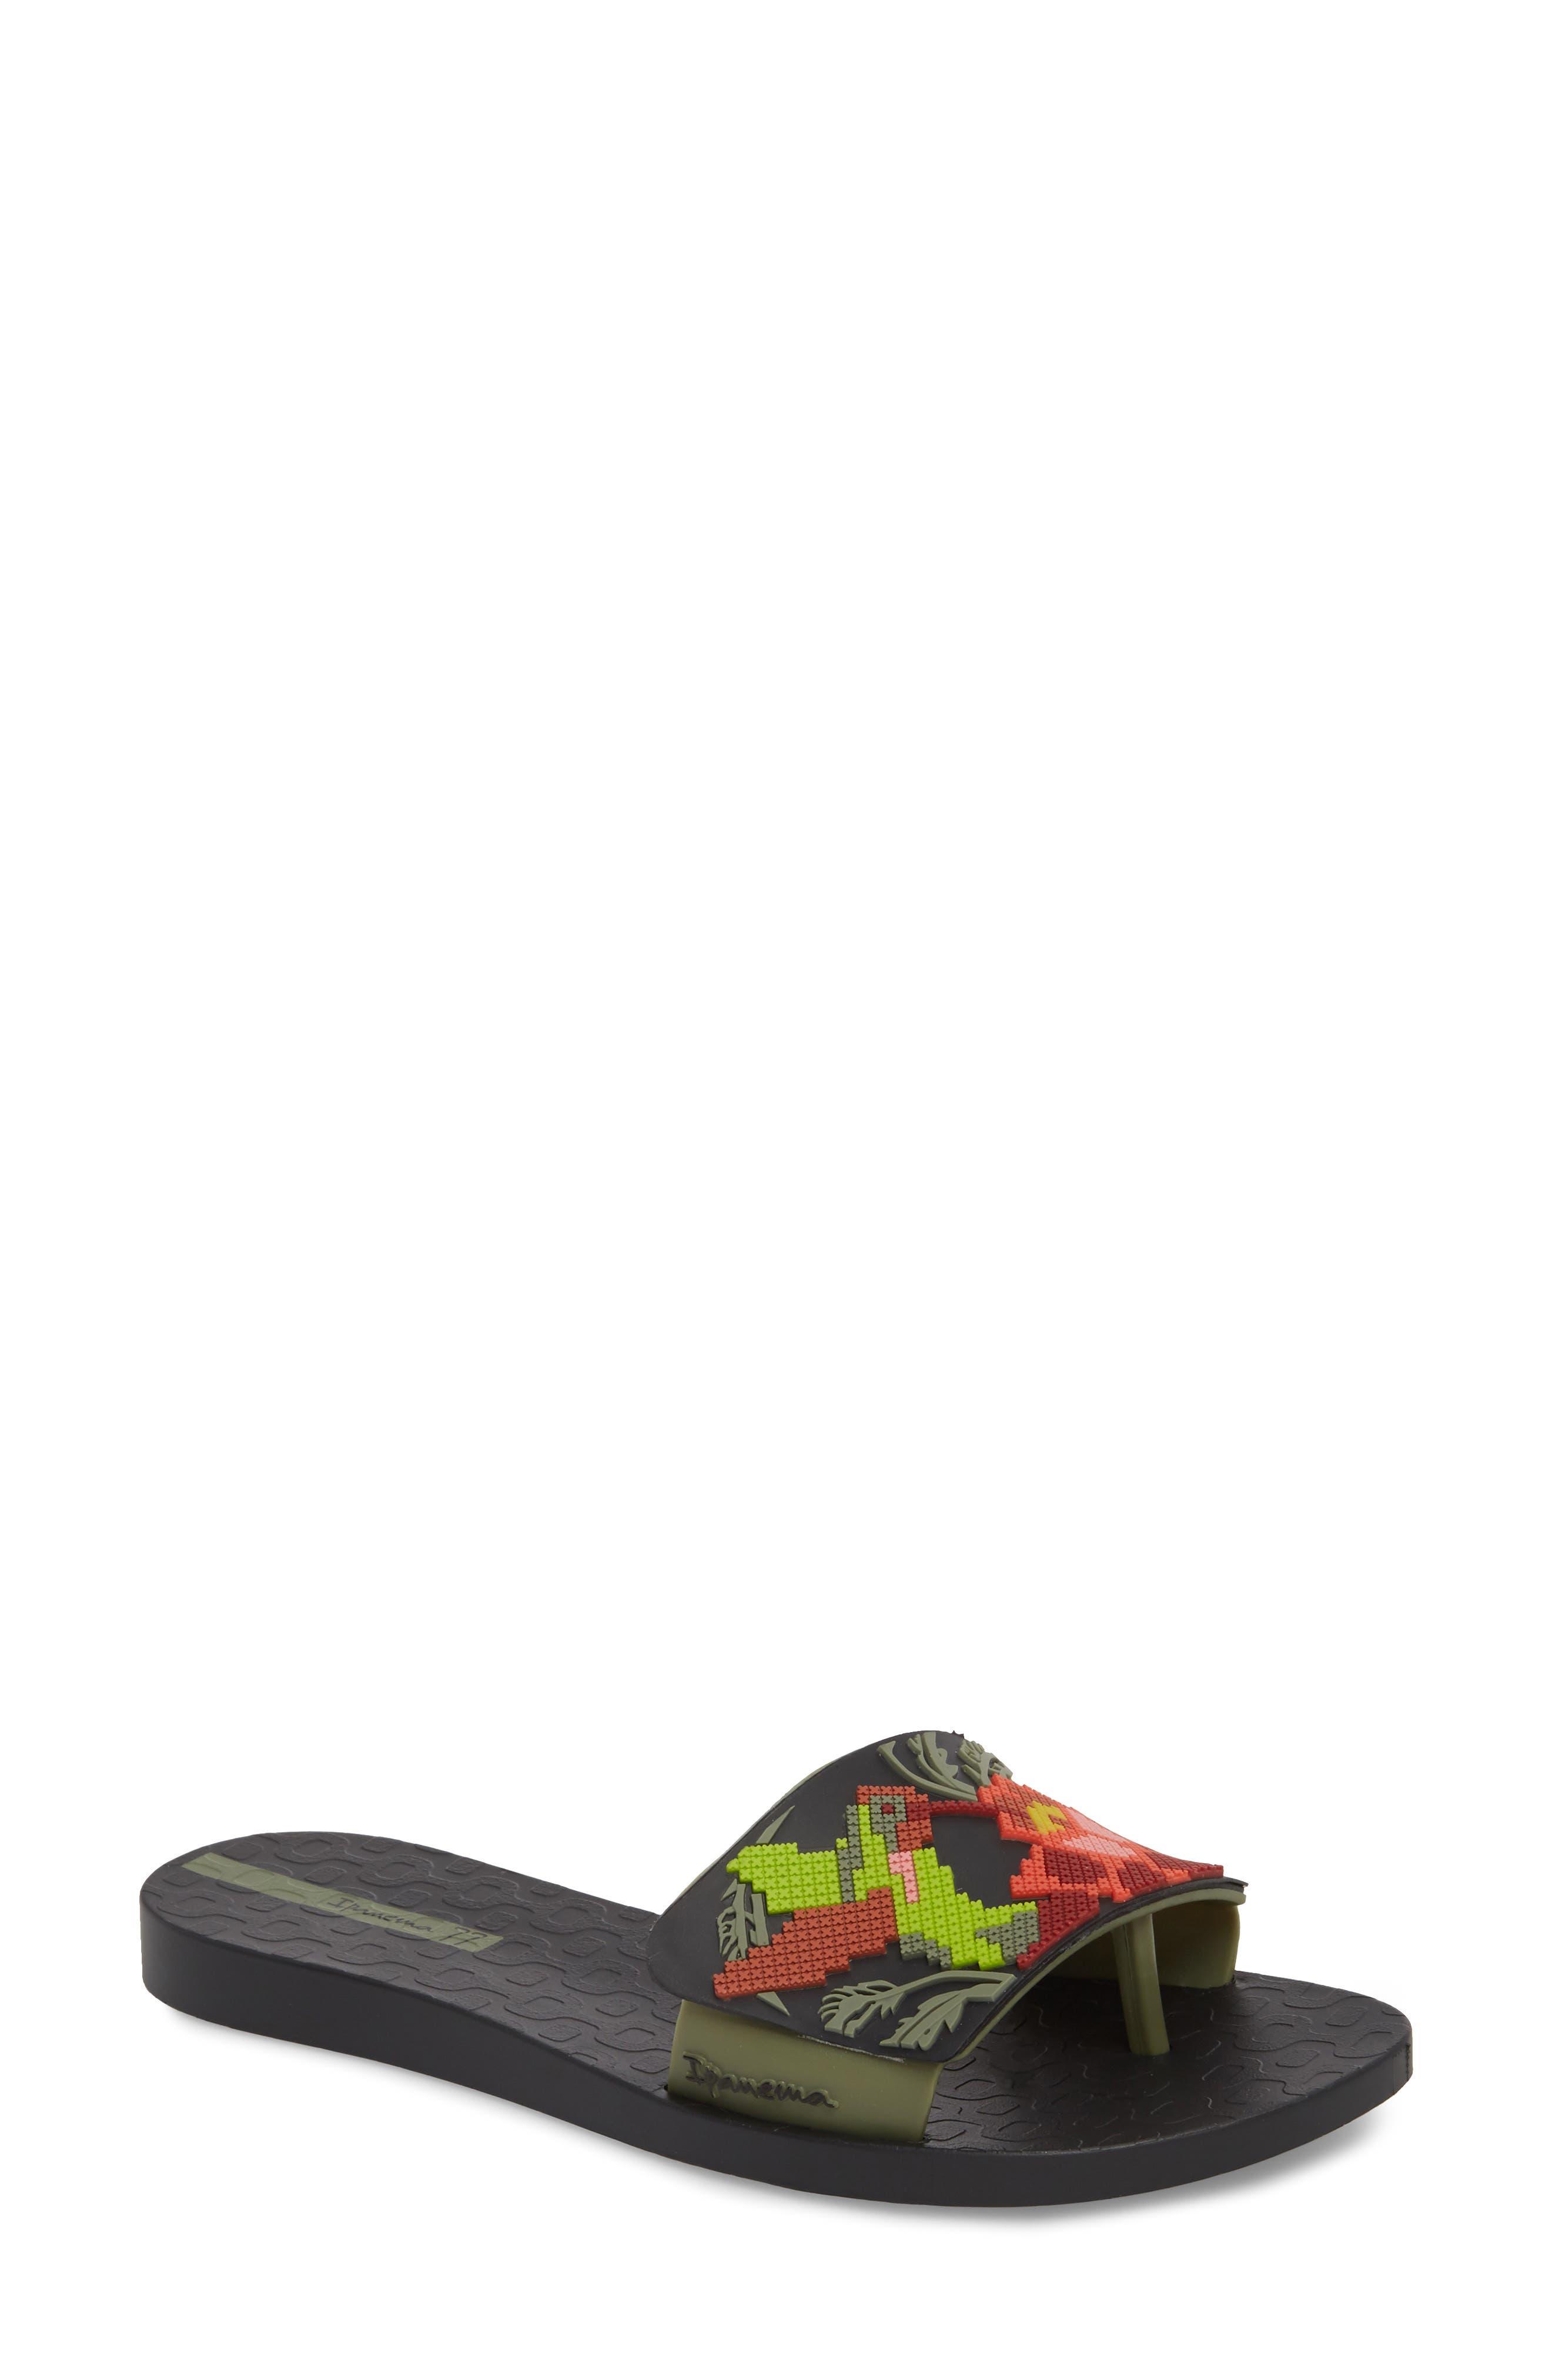 IPANEMA Nectar Floral Slide Sandal, Main, color, BLACK/ GREEN